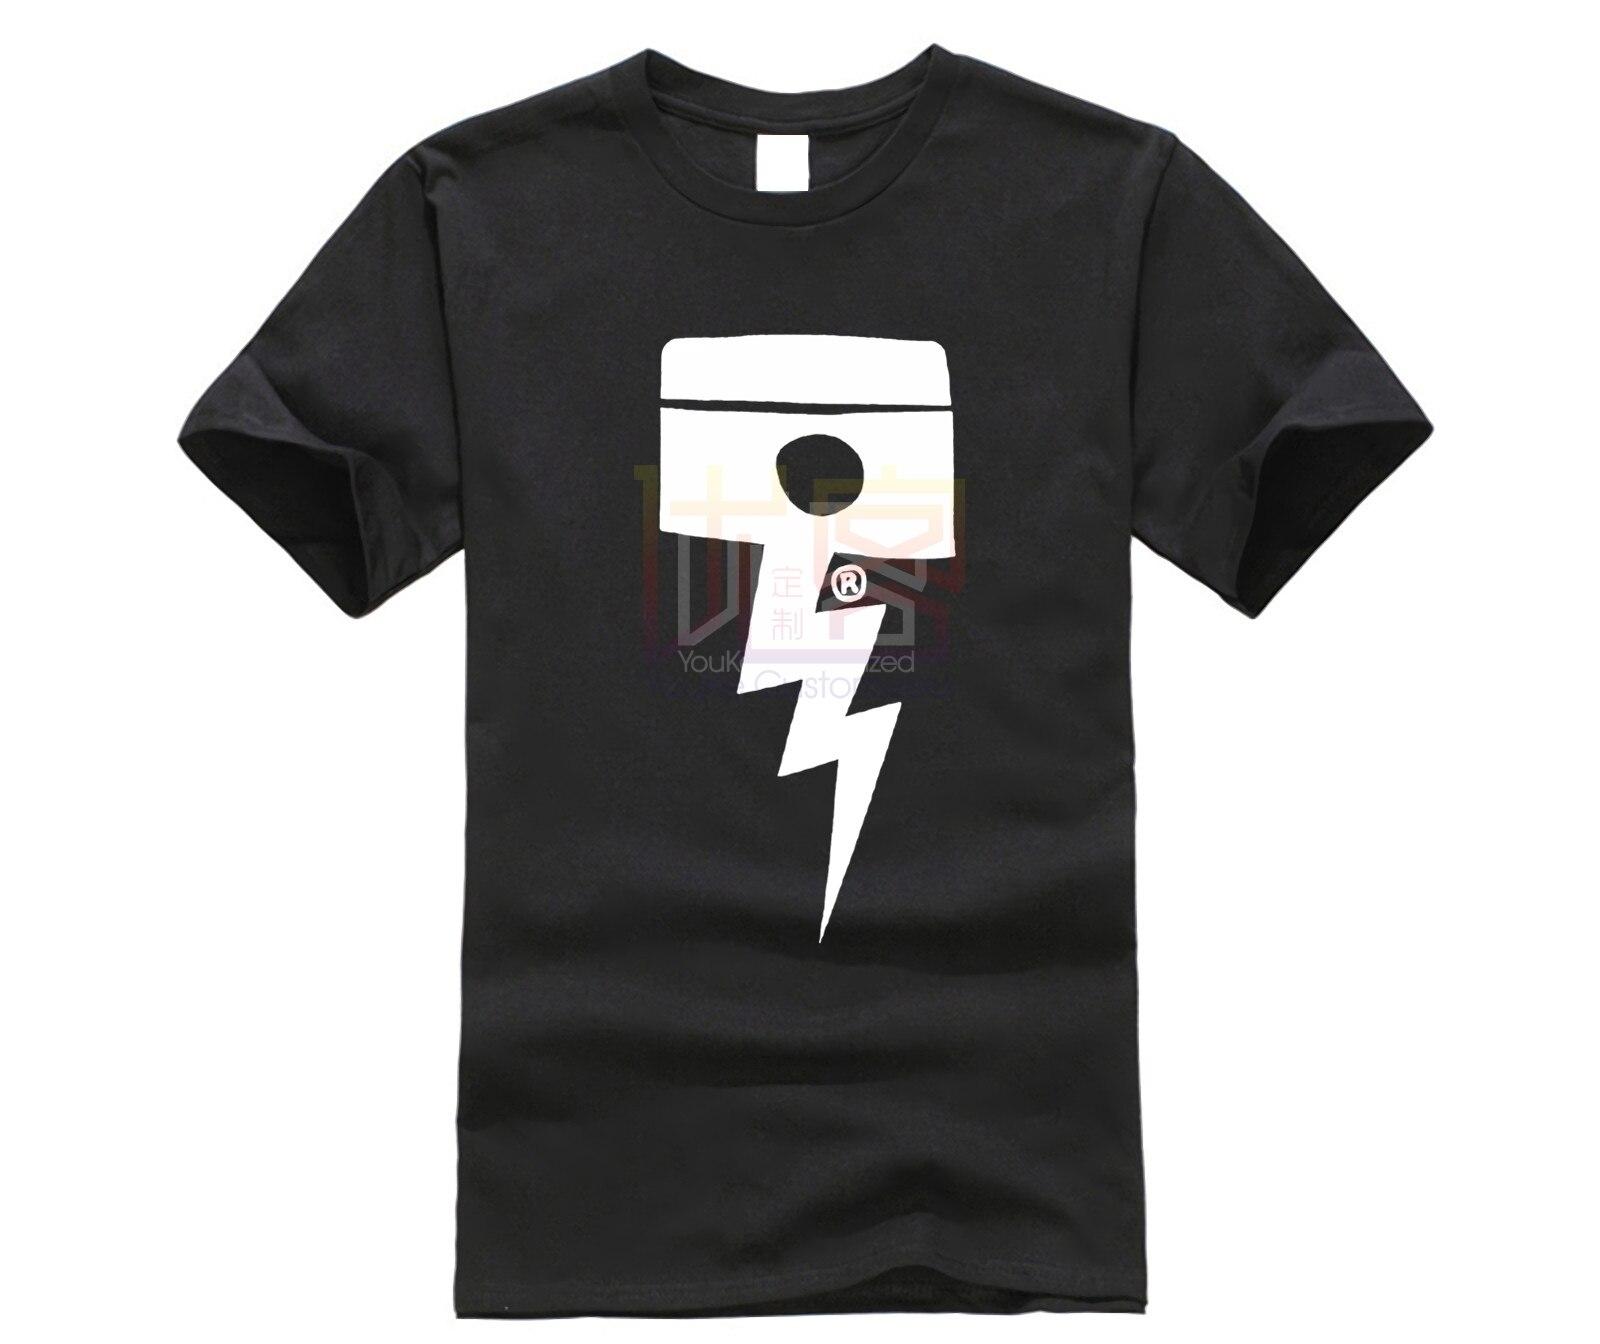 DEUS EX MACHINA PISSTIN T-SHIRT - BLACK 100% Cotton Clothing Short Sleeve Tees Cool Street T-Shirt Casual Short Sleeve Top